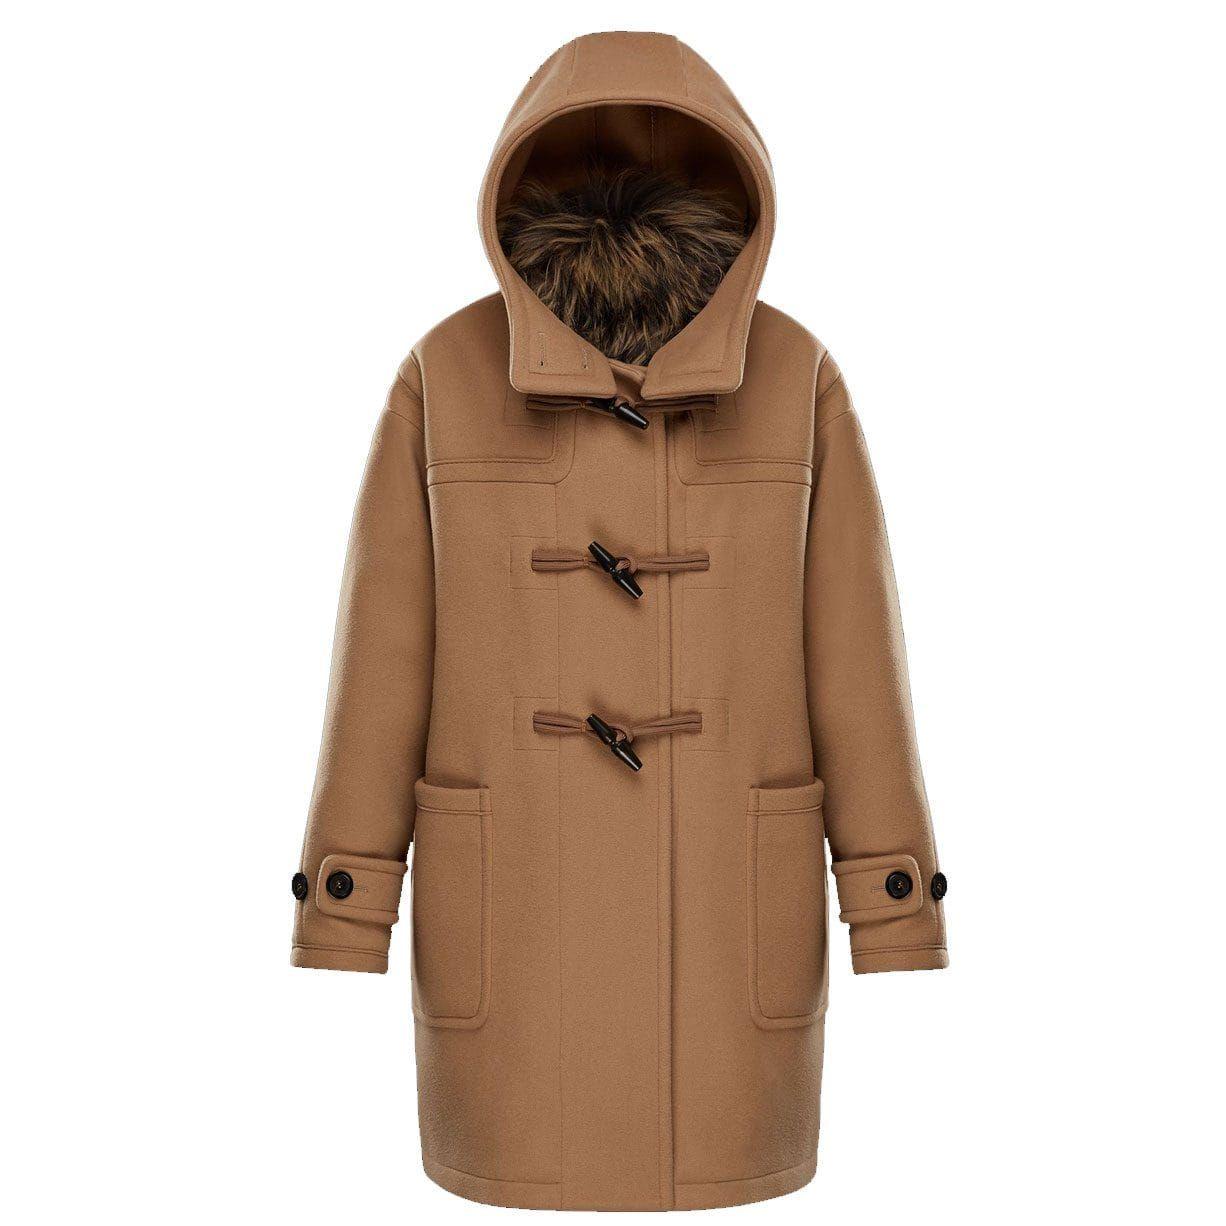 Moncler Narcissus duffle coat | Coat, Duffle coat, Fashion